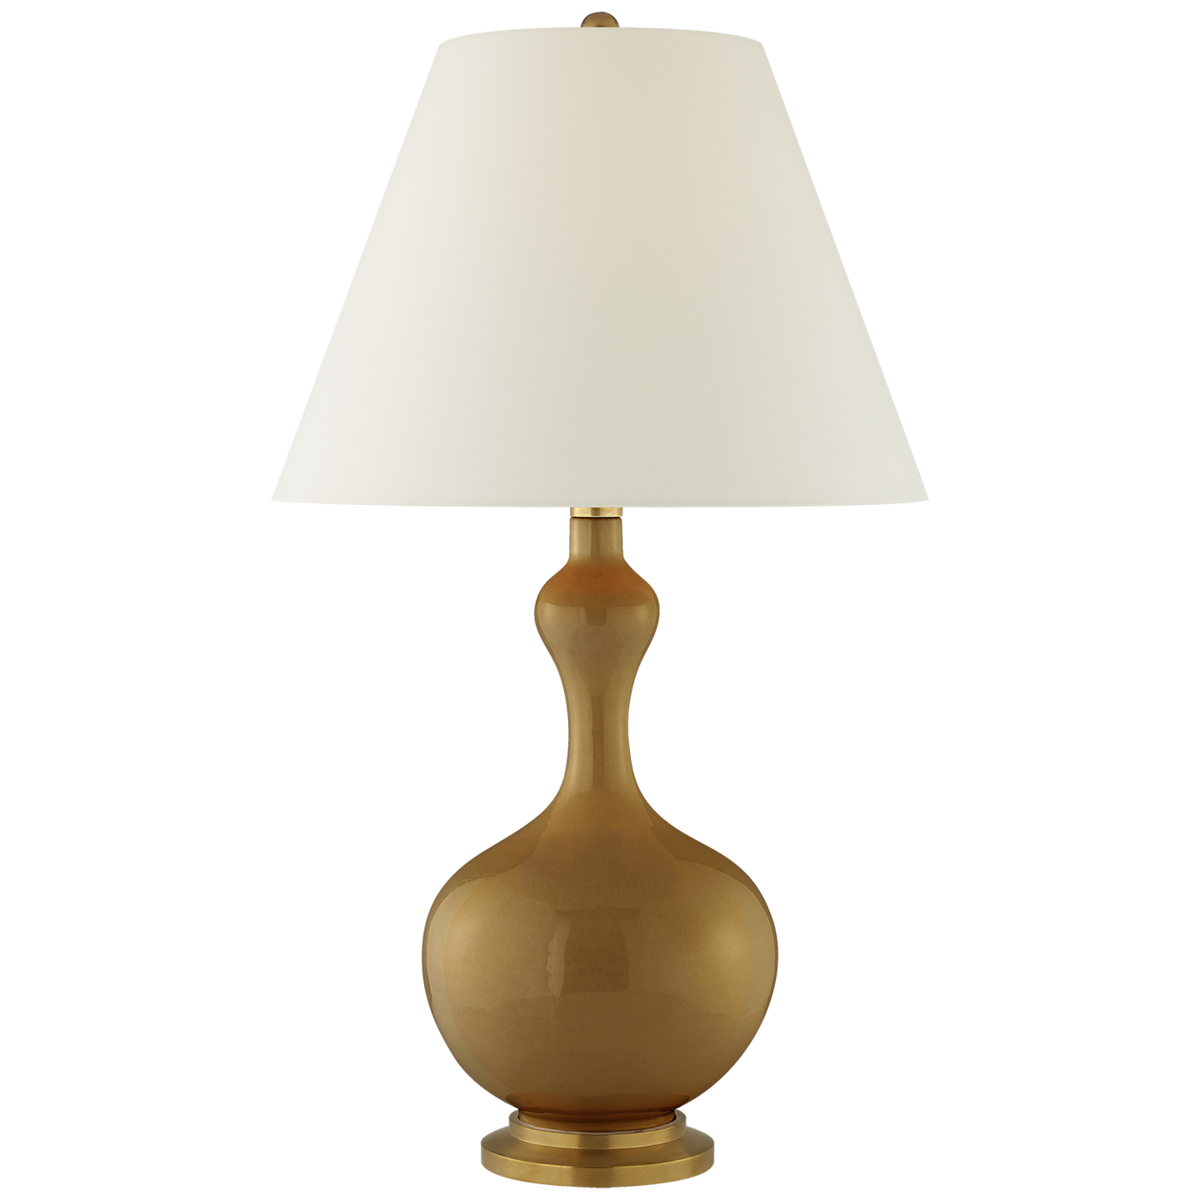 Addison Large Table Lamp